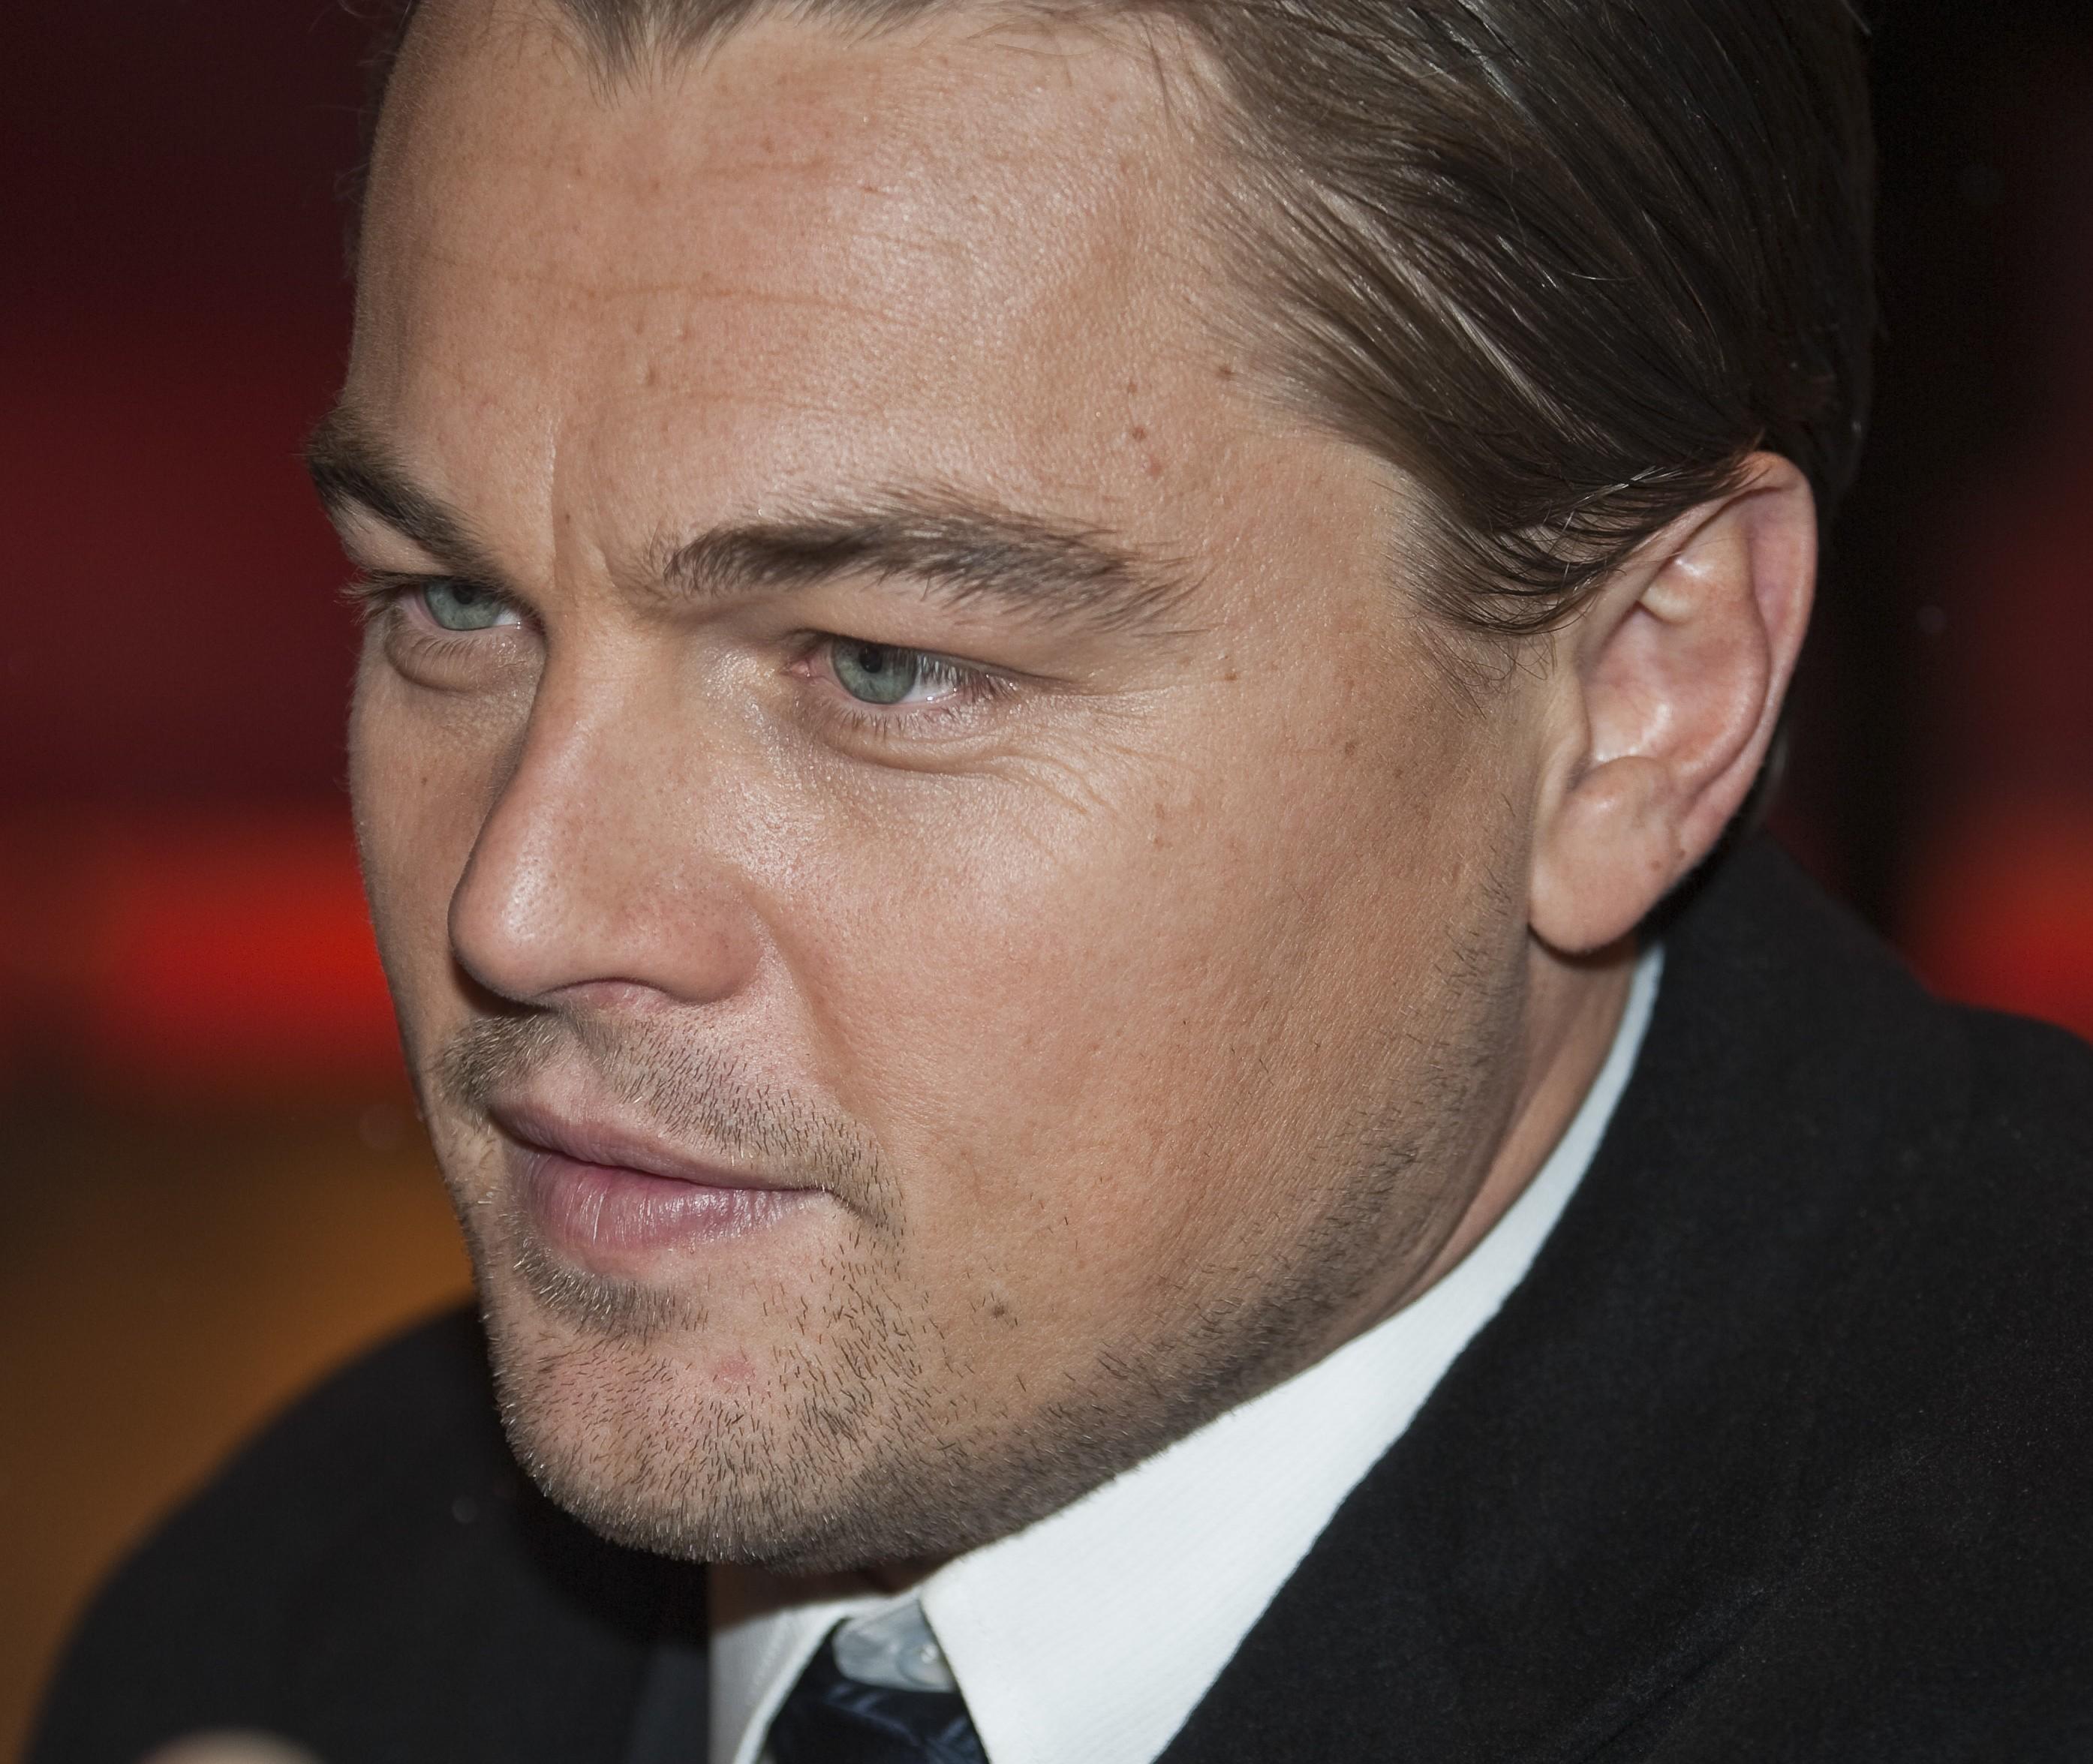 Leonardo_DiCaprio_(Berlin_Film_Festival_2010)_2_(cropped).jpg (2789×2351)